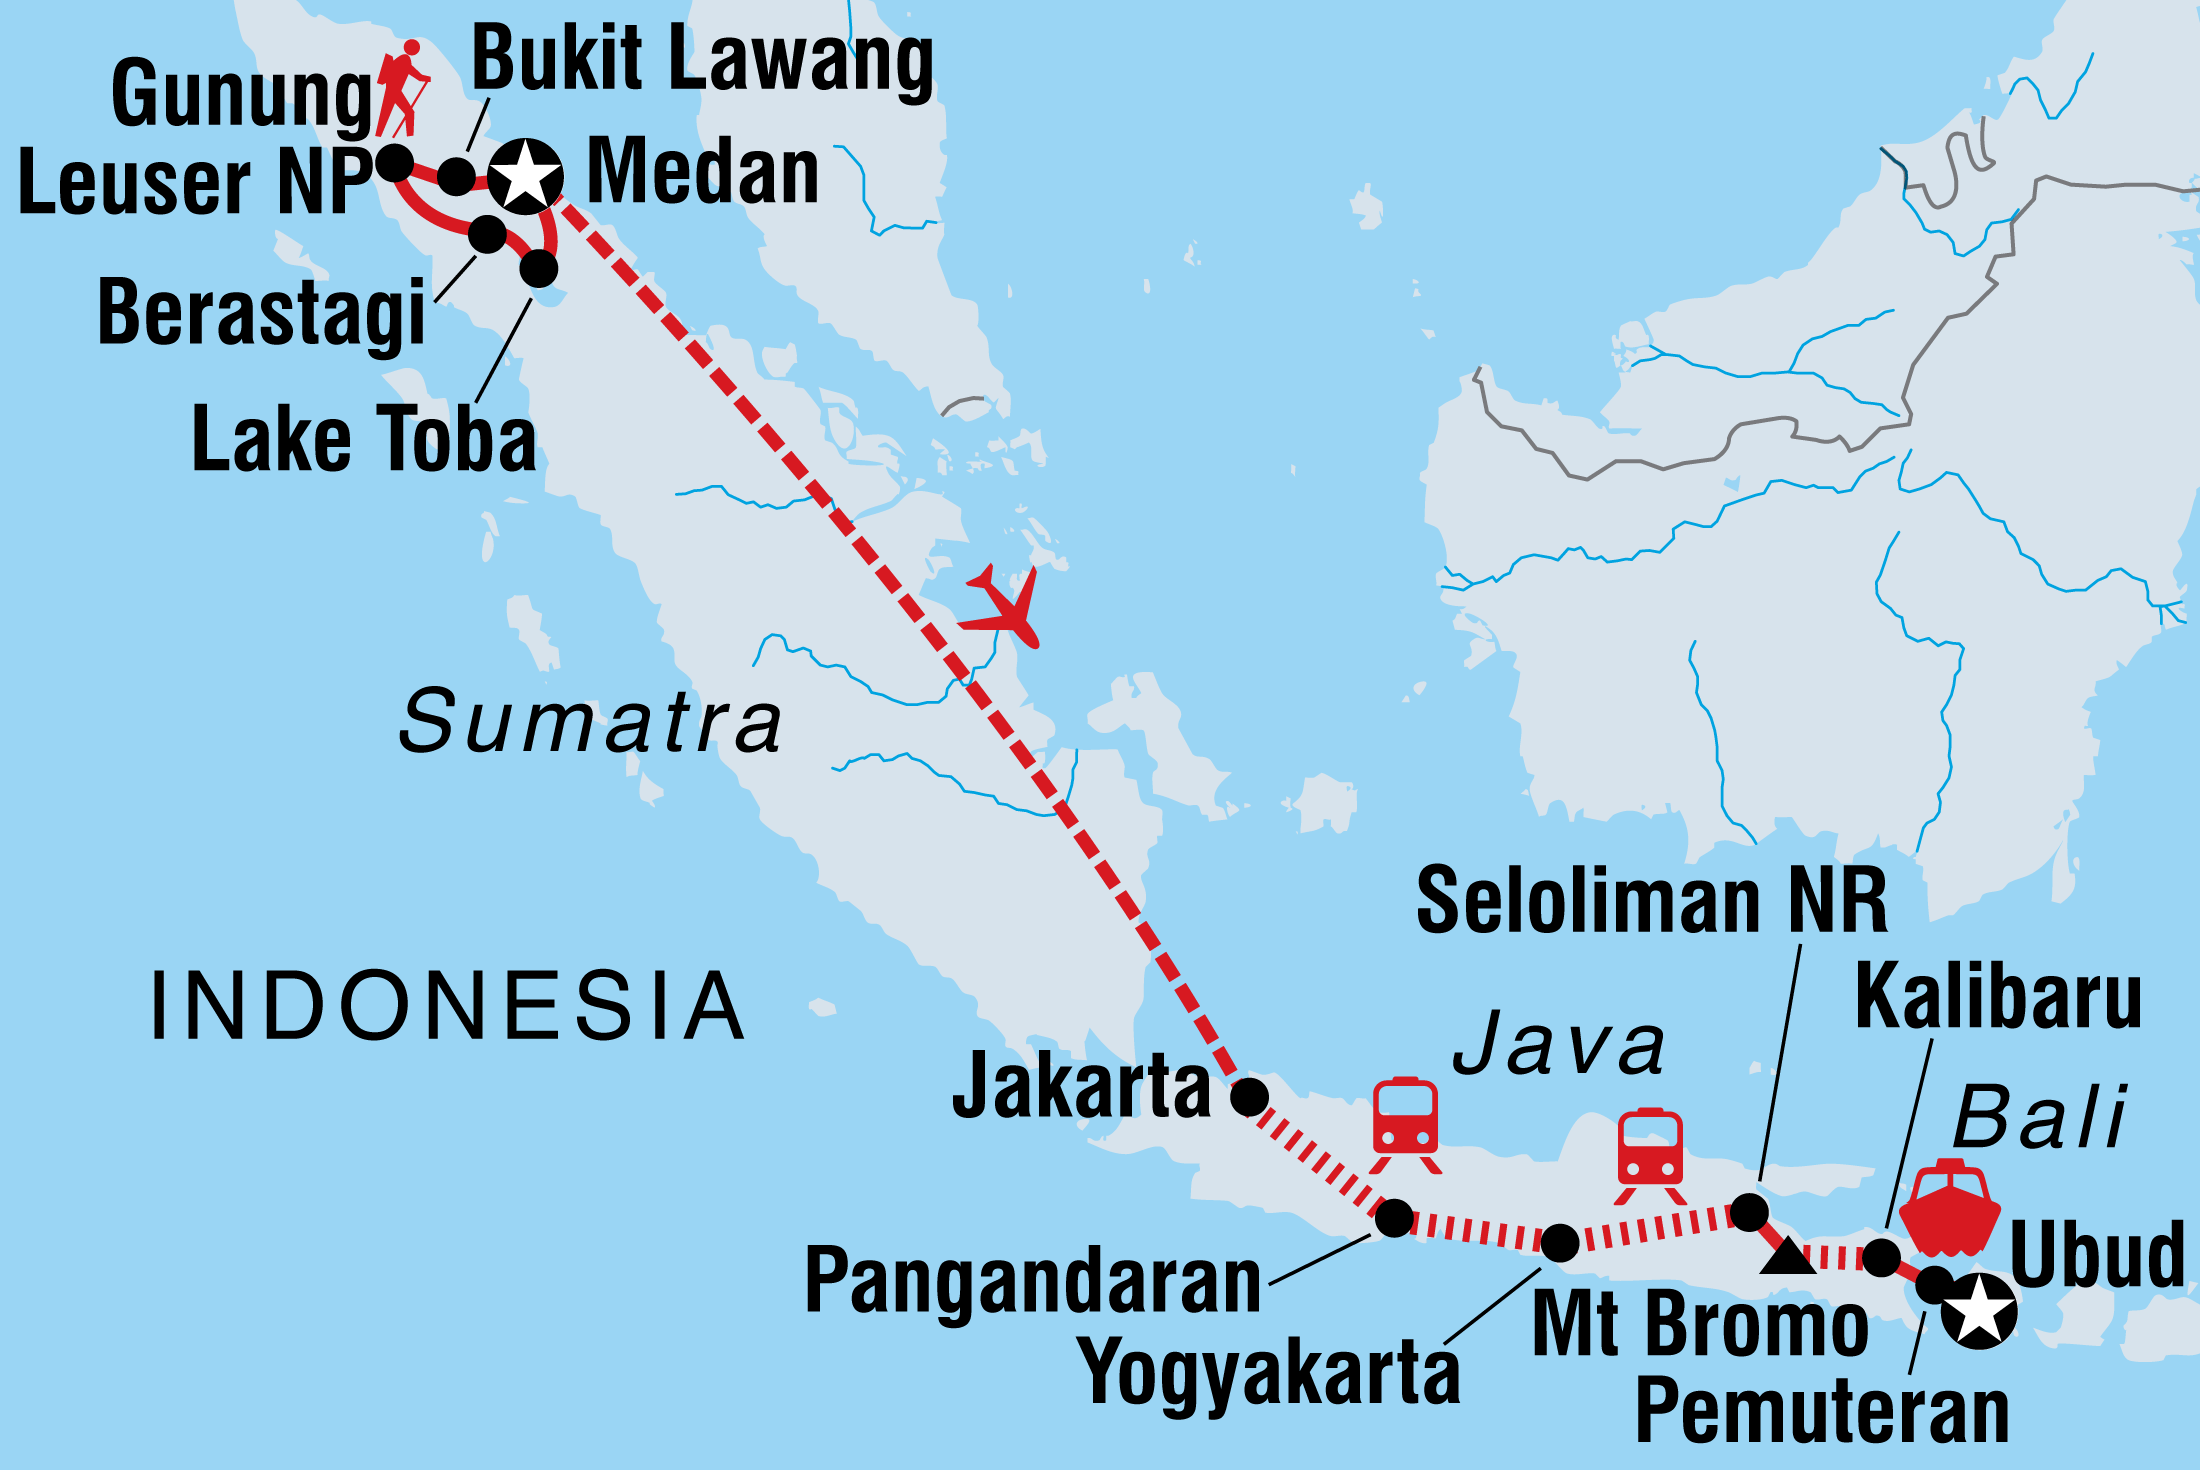 Best Of Indonesia Intrepid Travel Gb Voucher Share Tea 50000